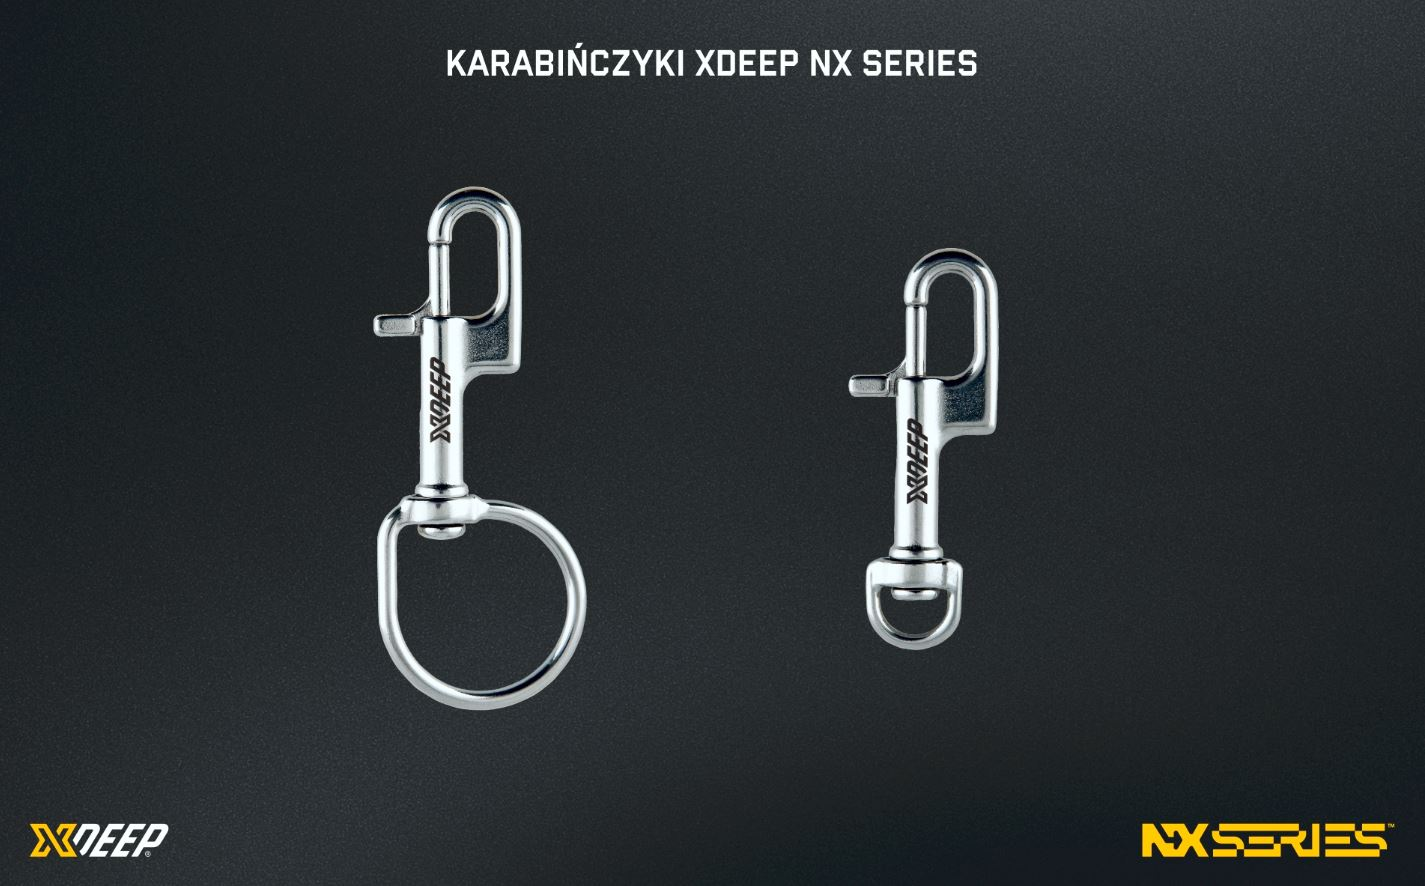 Karabińczyki NX Series Xdeep